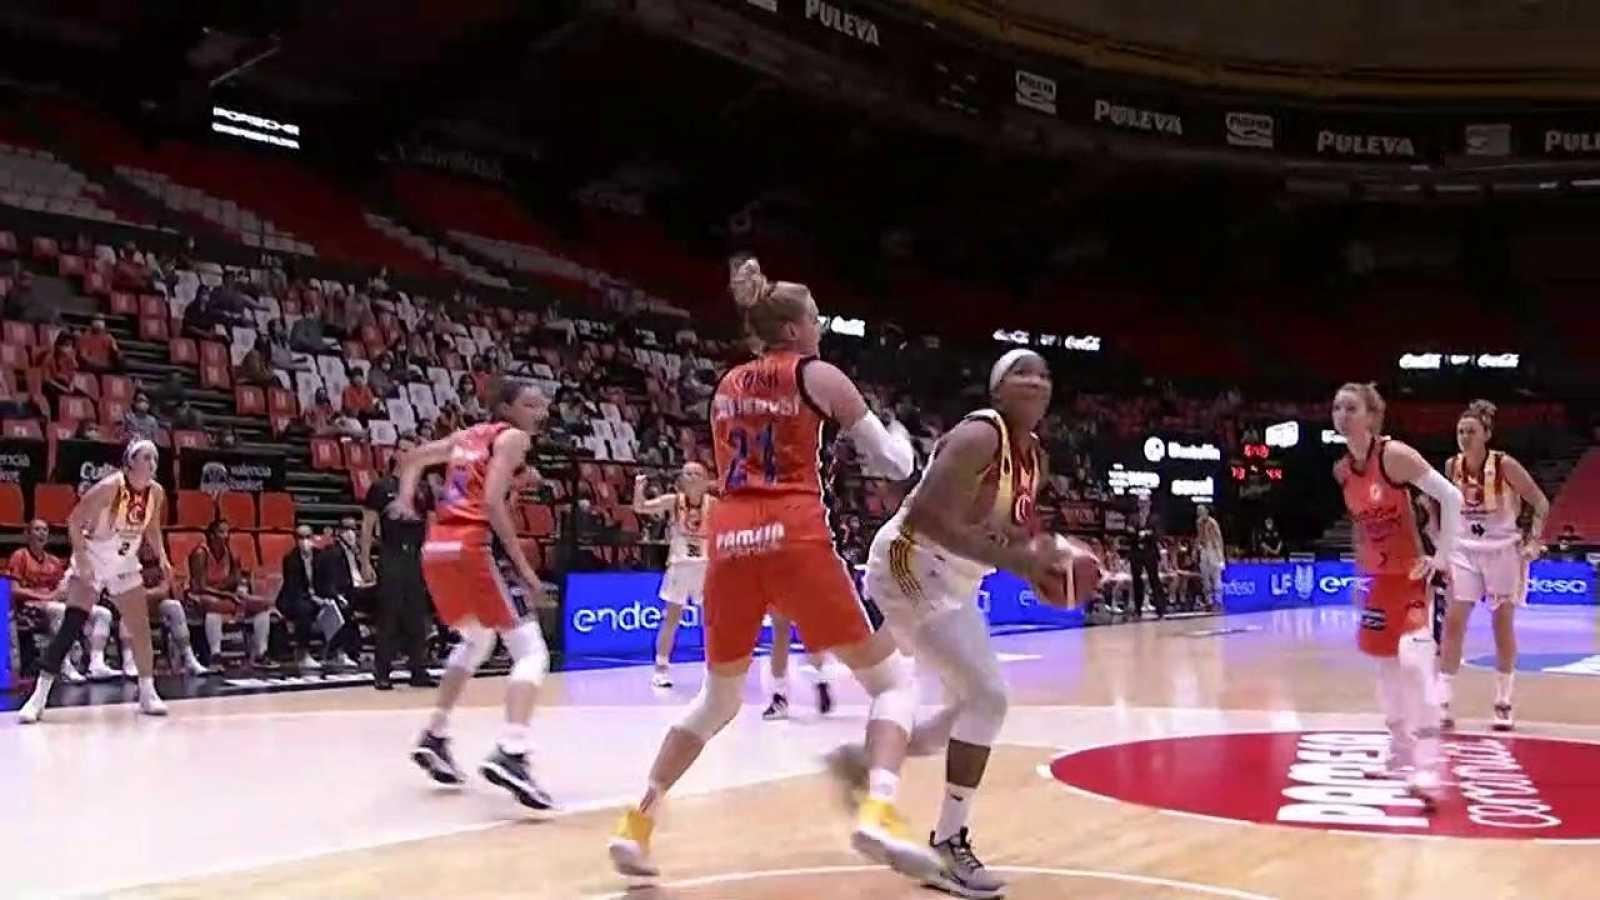 Baloncesto - Liga femenina Endesa 3ª jornada: Valencia BC - Casademont Zaragoza - ver ahora